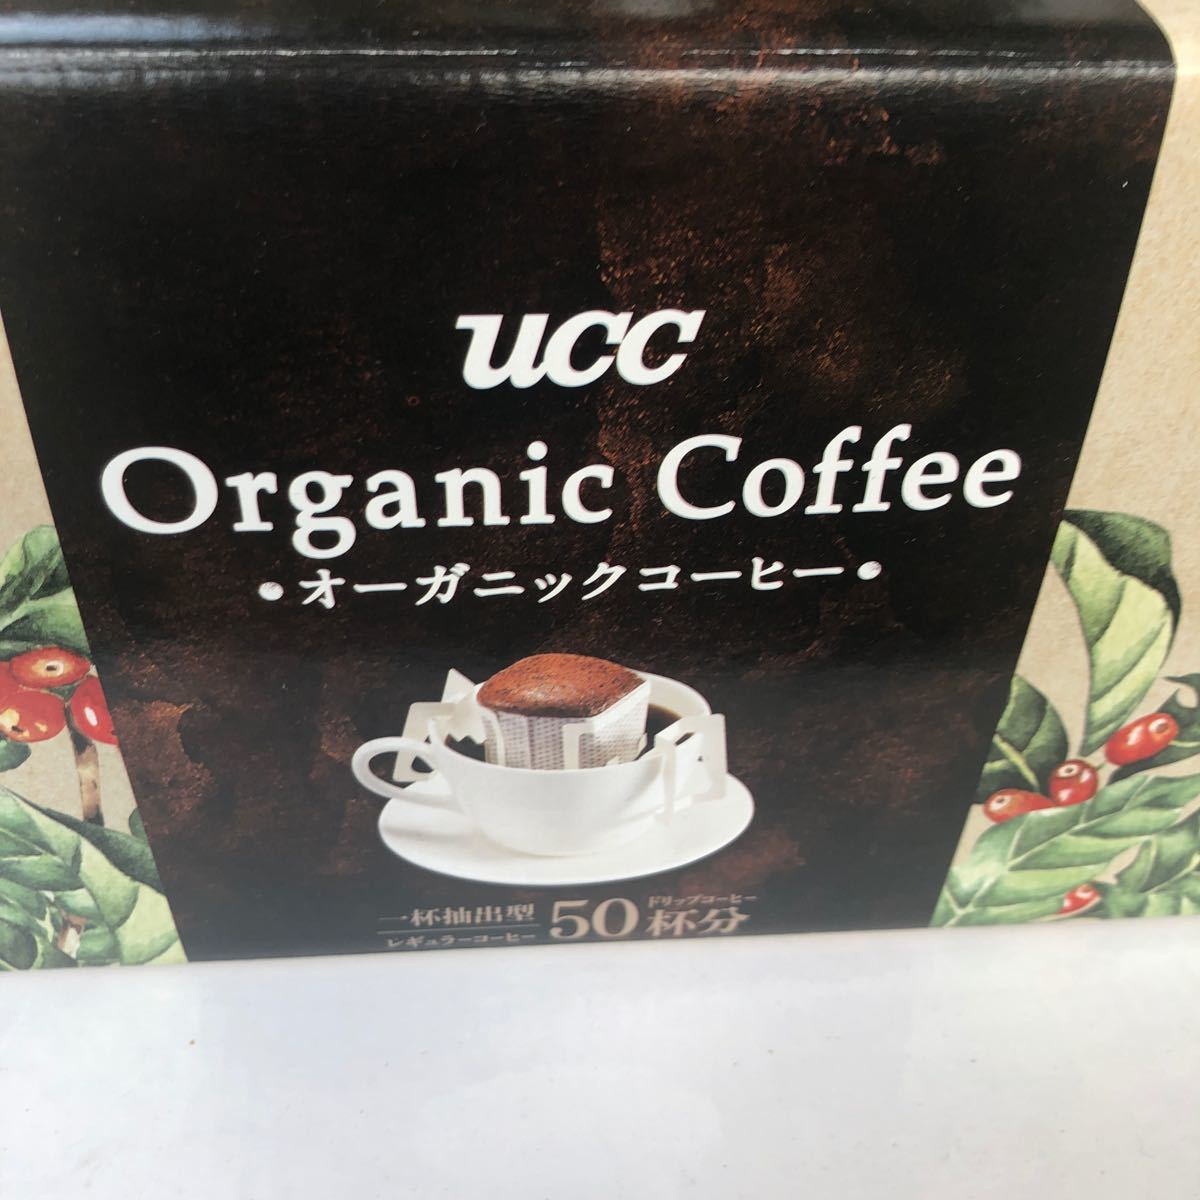 UCC オーガニックコーヒー ドリップコーヒー50杯分